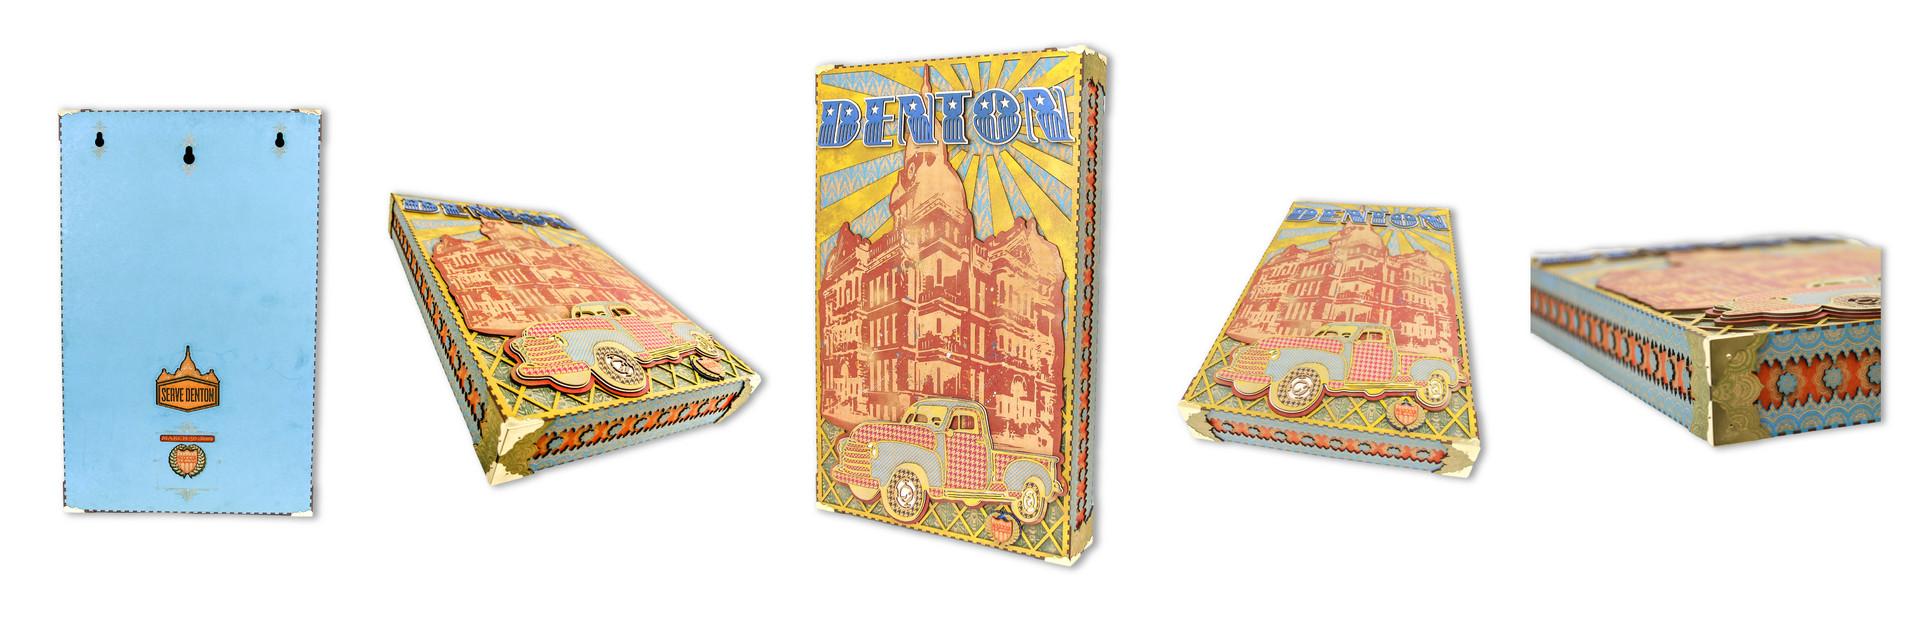 SERVE DENTON CHARITY AUCTION WOOD ART BOX